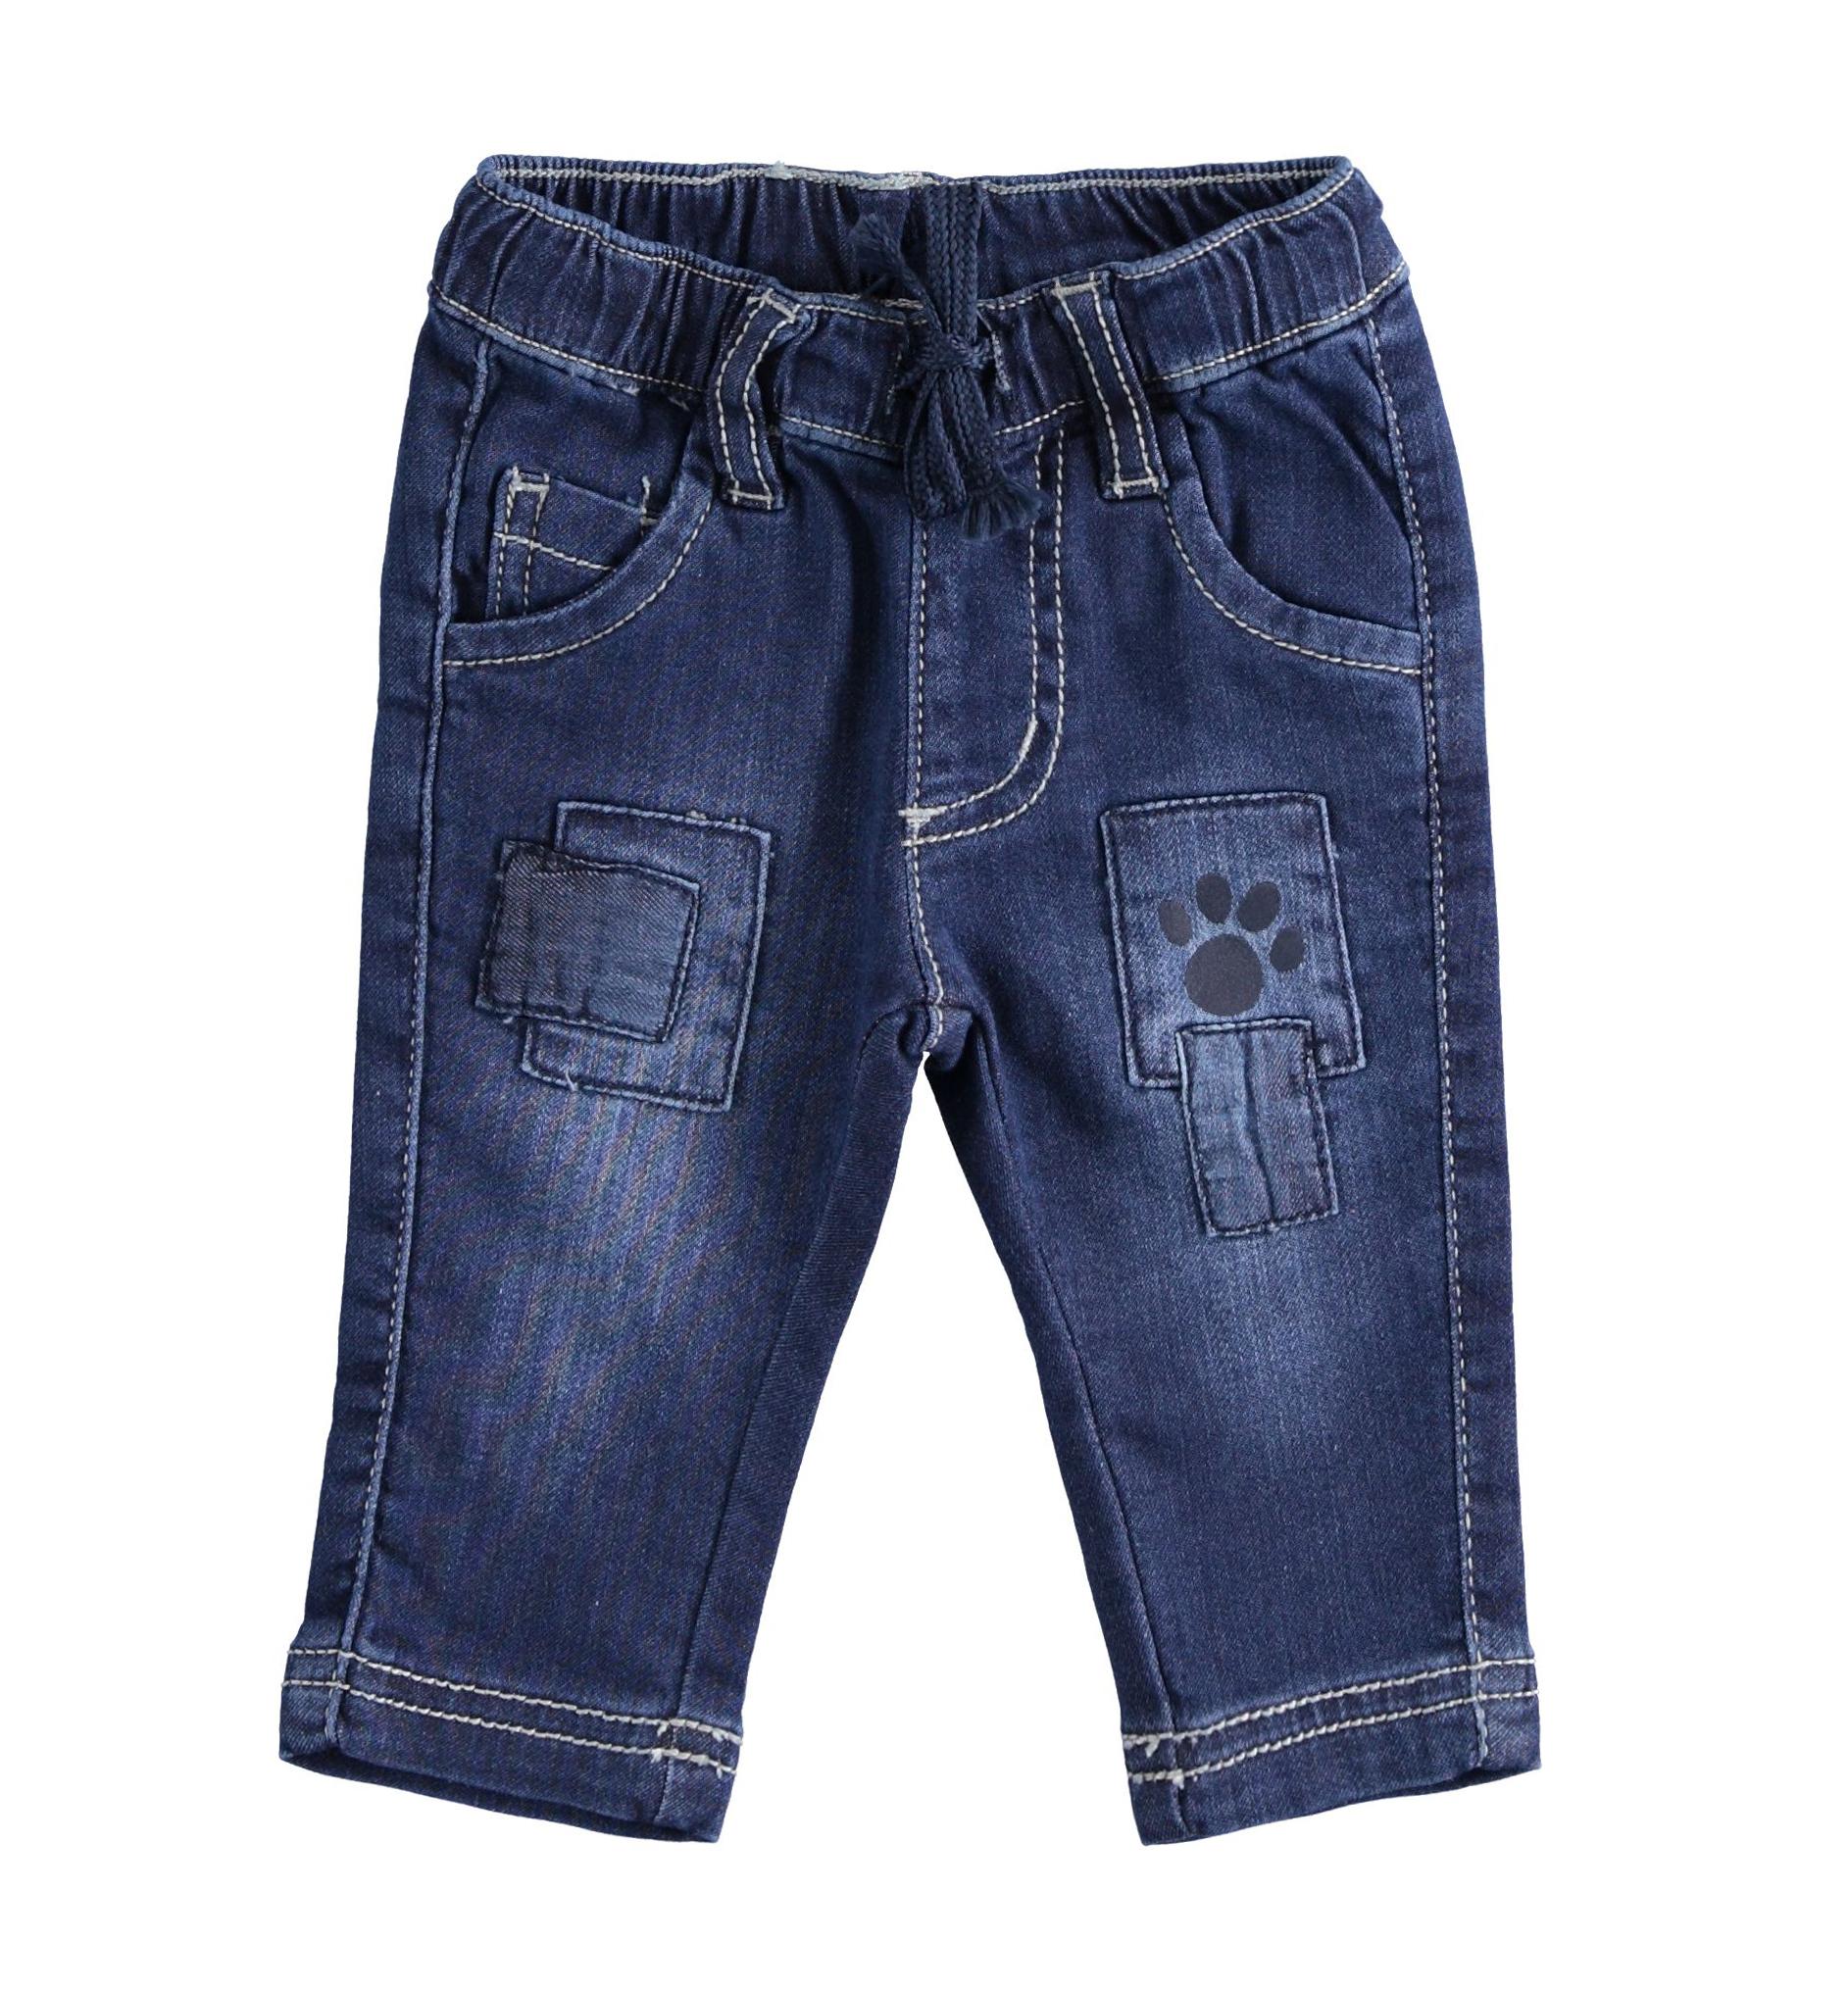 Farmer hatású újszülött kisfiú nadrág